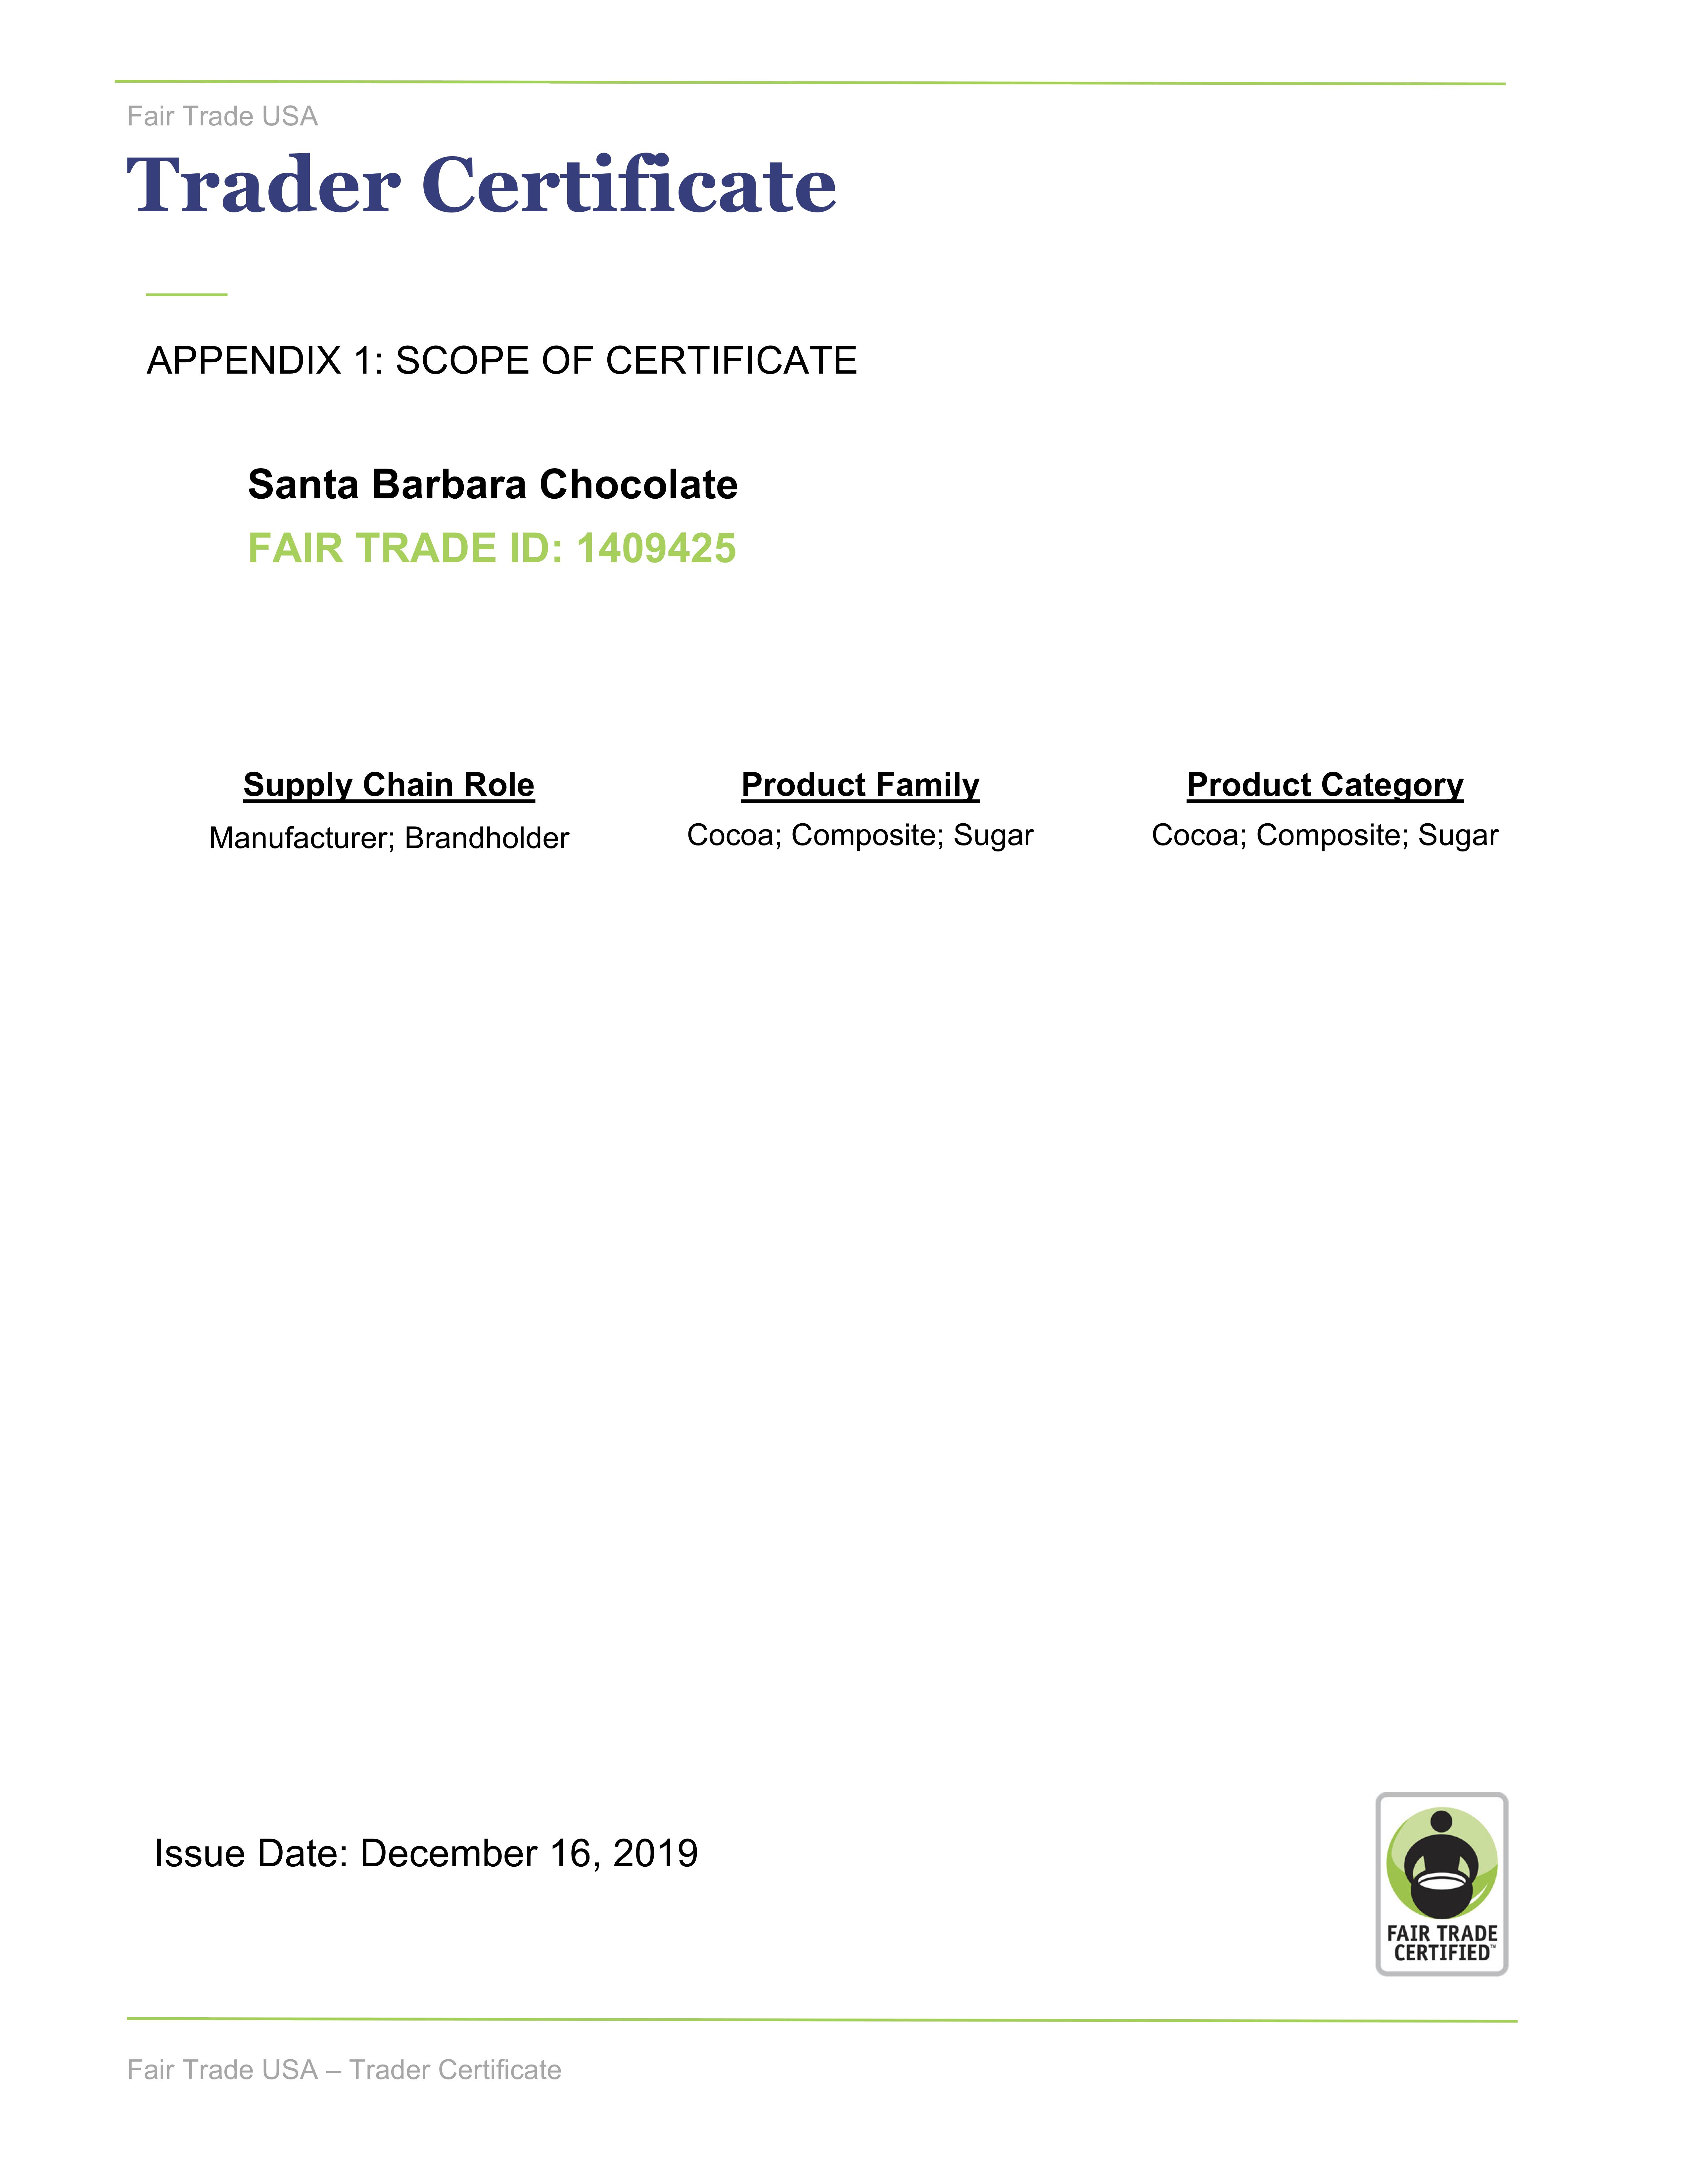 fair-trade-usa-2020-trader-certificate-2.jpg